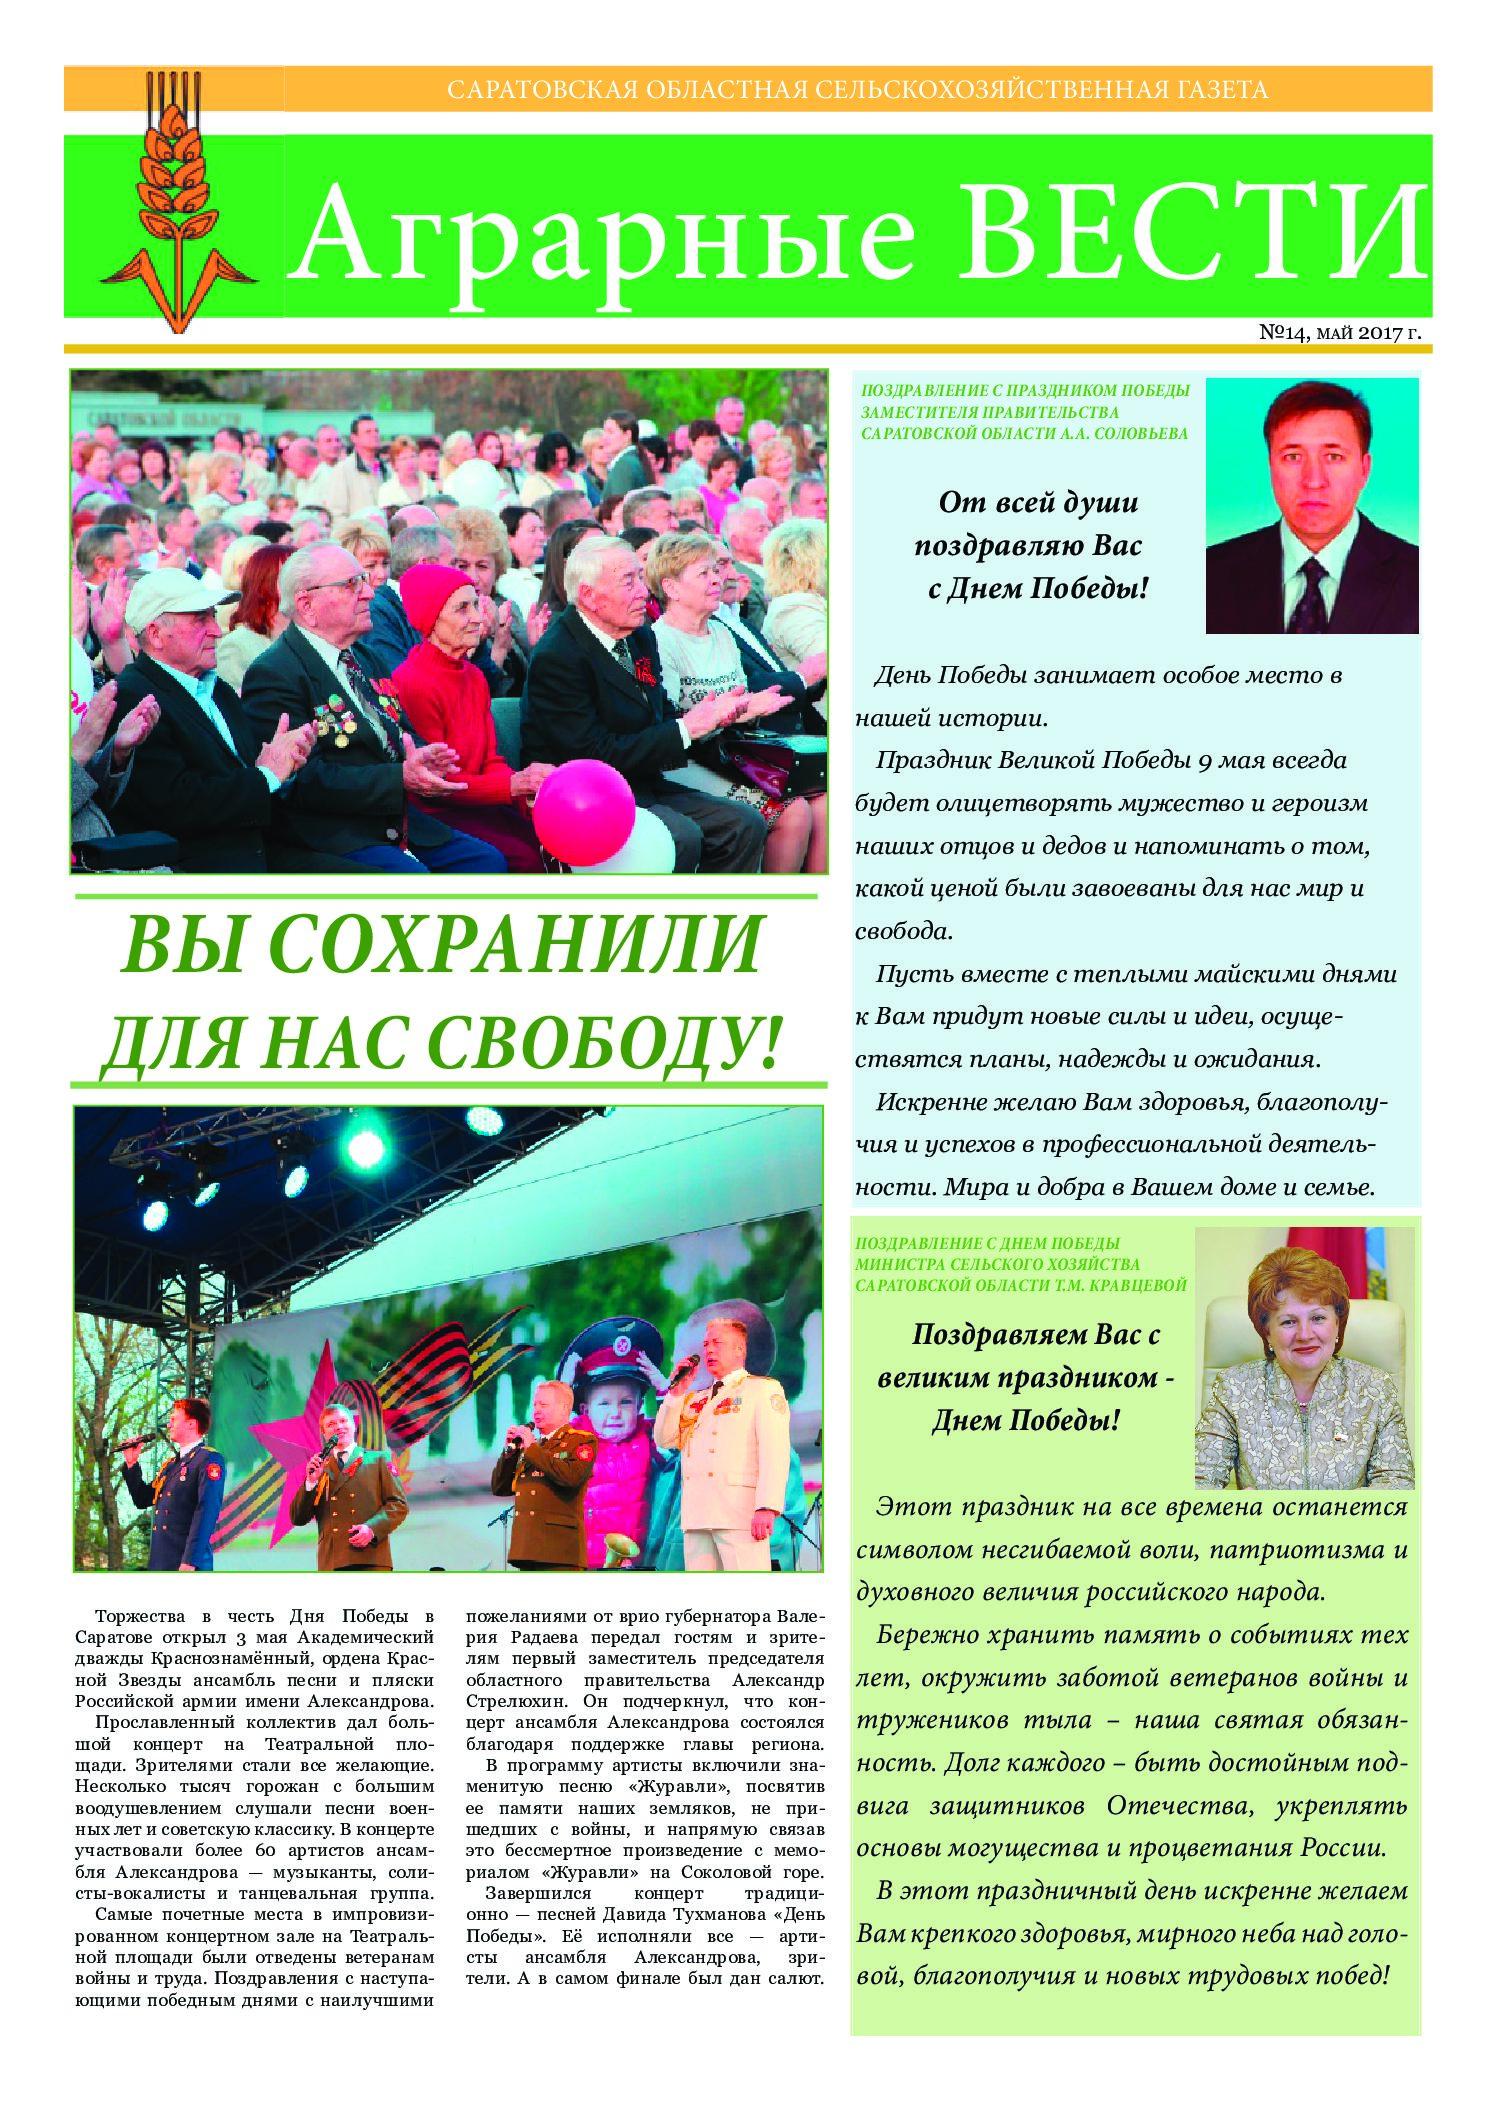 https://saratovagro.ru/wp-content/uploads/2020/08/май-14-pdf.jpg